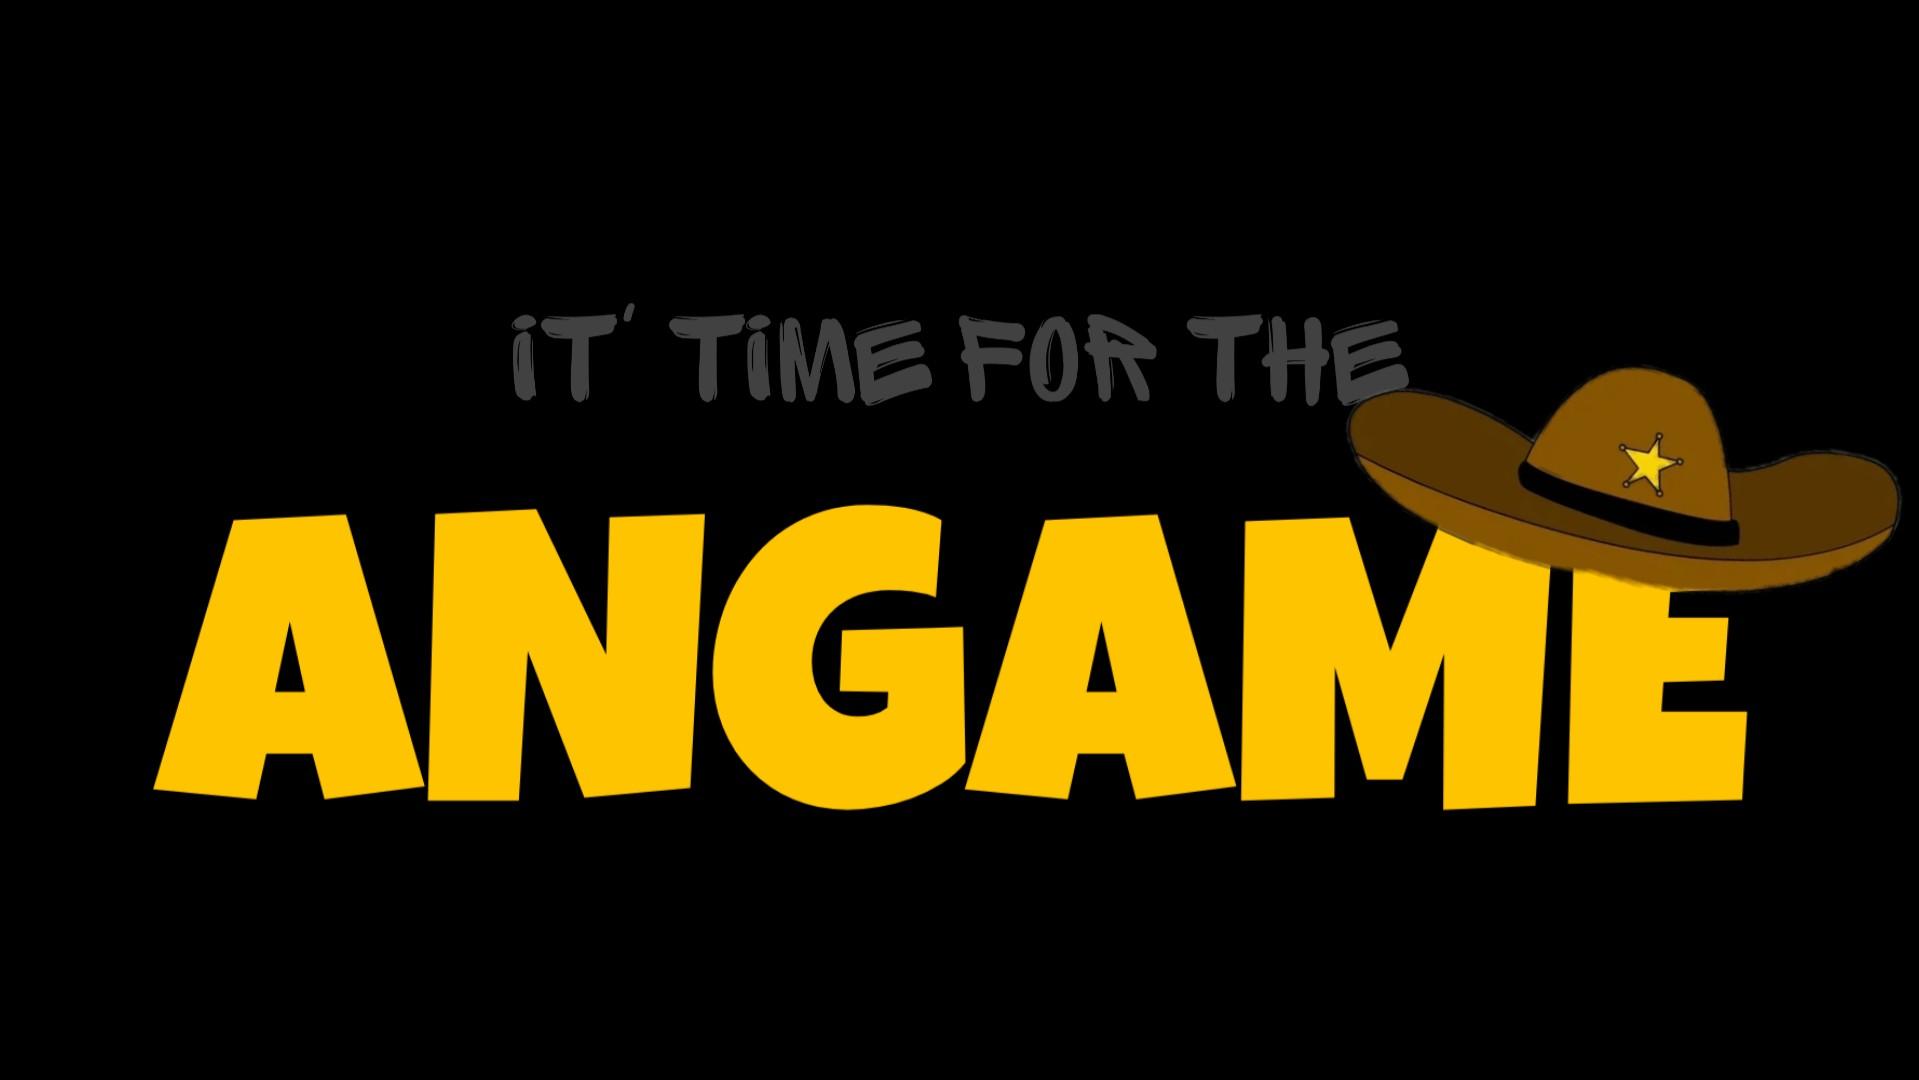 Angry Birds: Suspicious Owl III: Angame